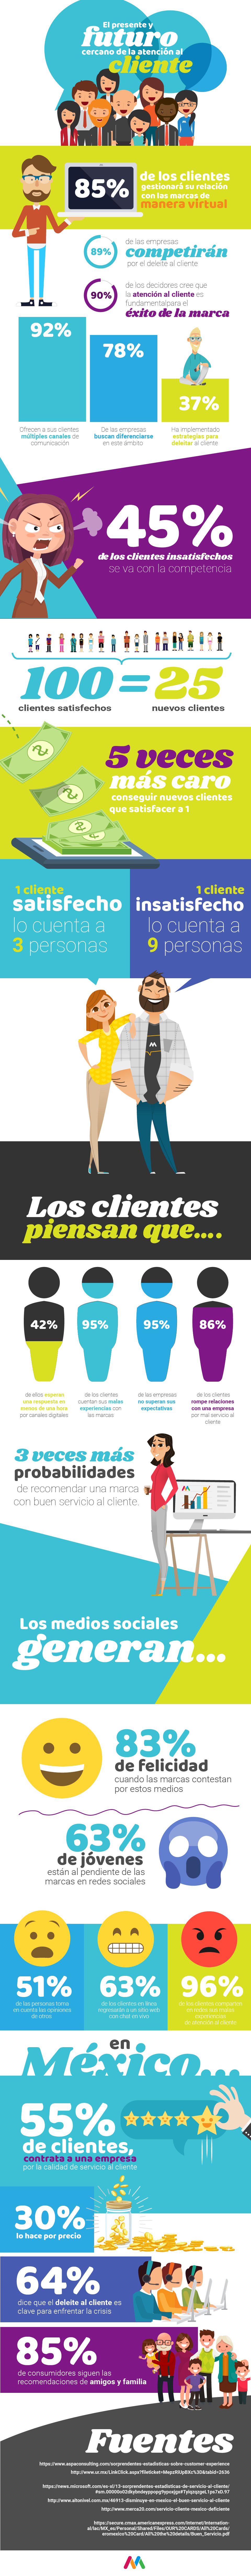 Servicio al Clientes Infografia Media Source